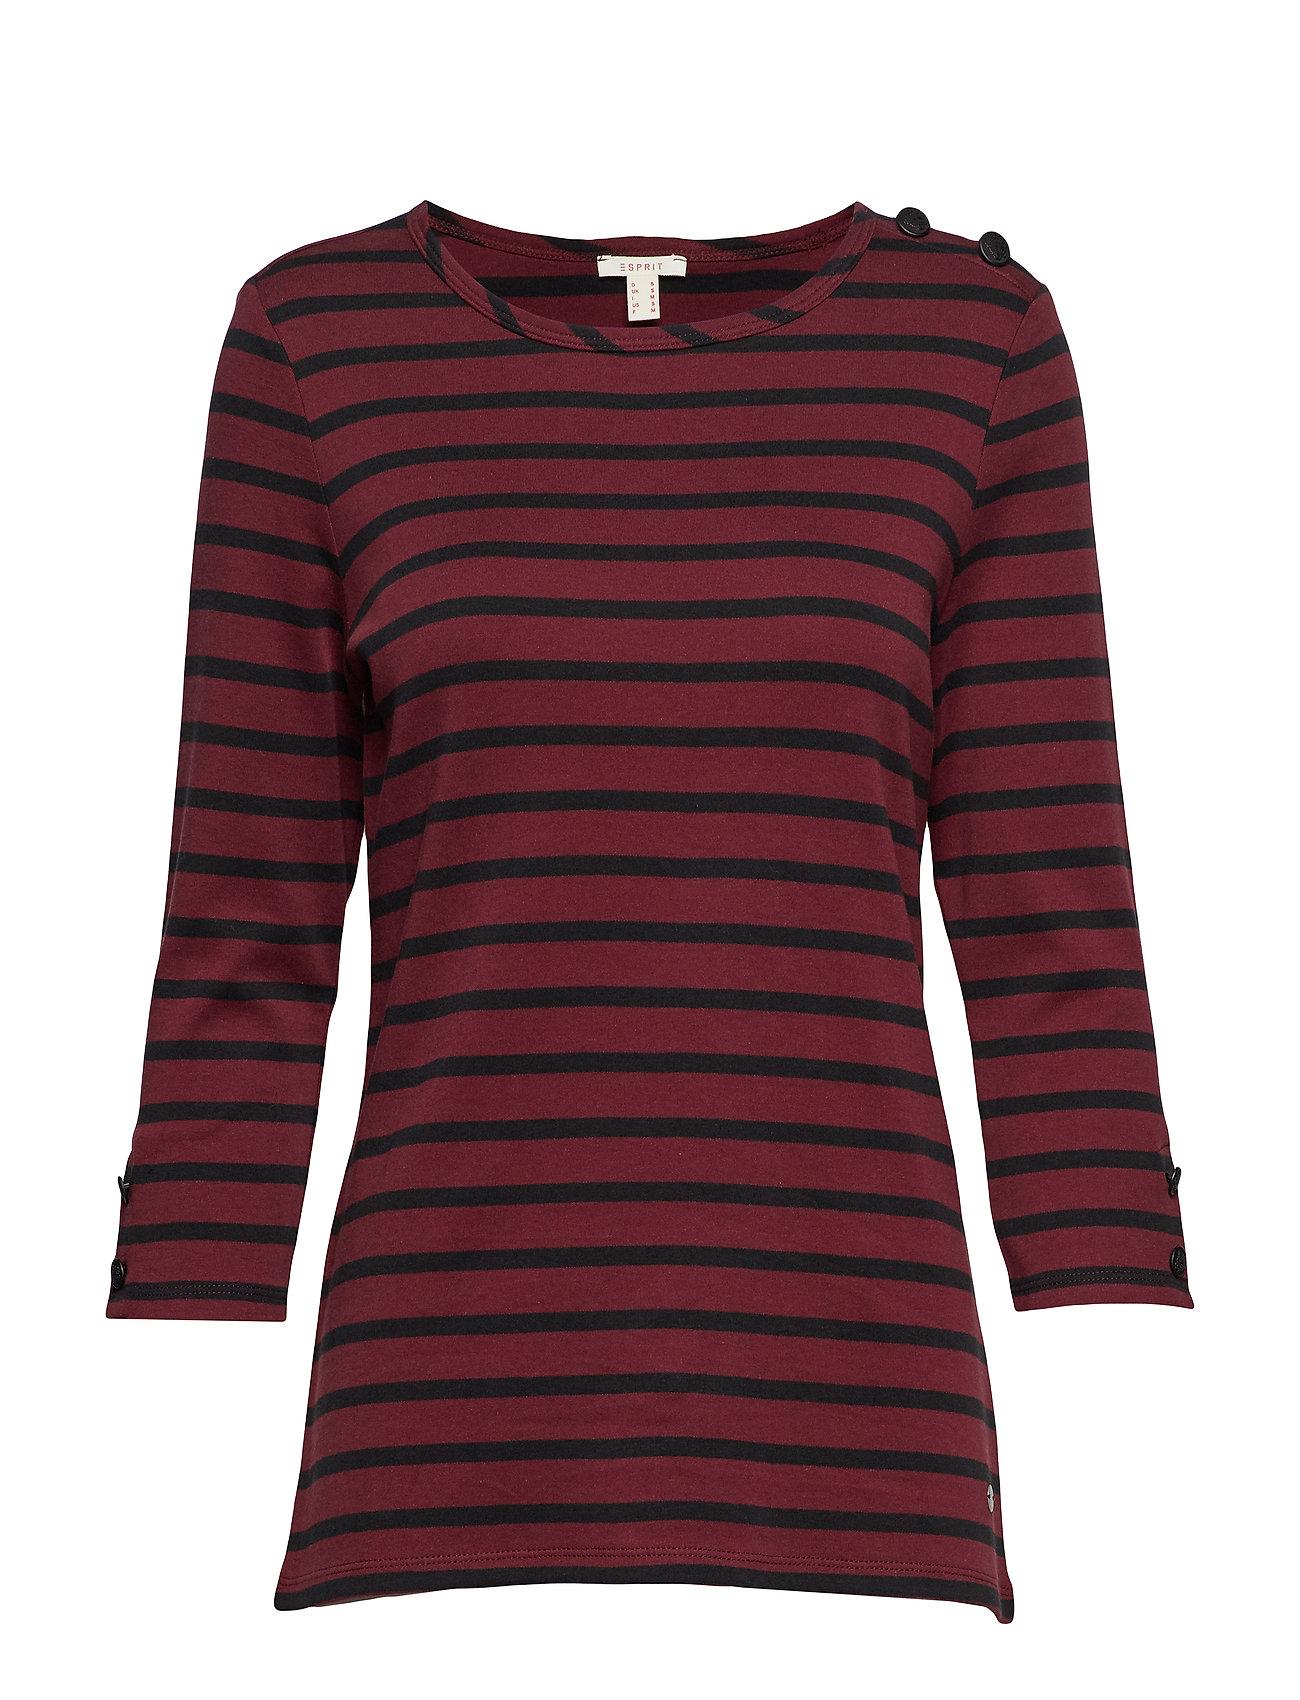 Esprit Casual T-Shirts - GARNET RED 4